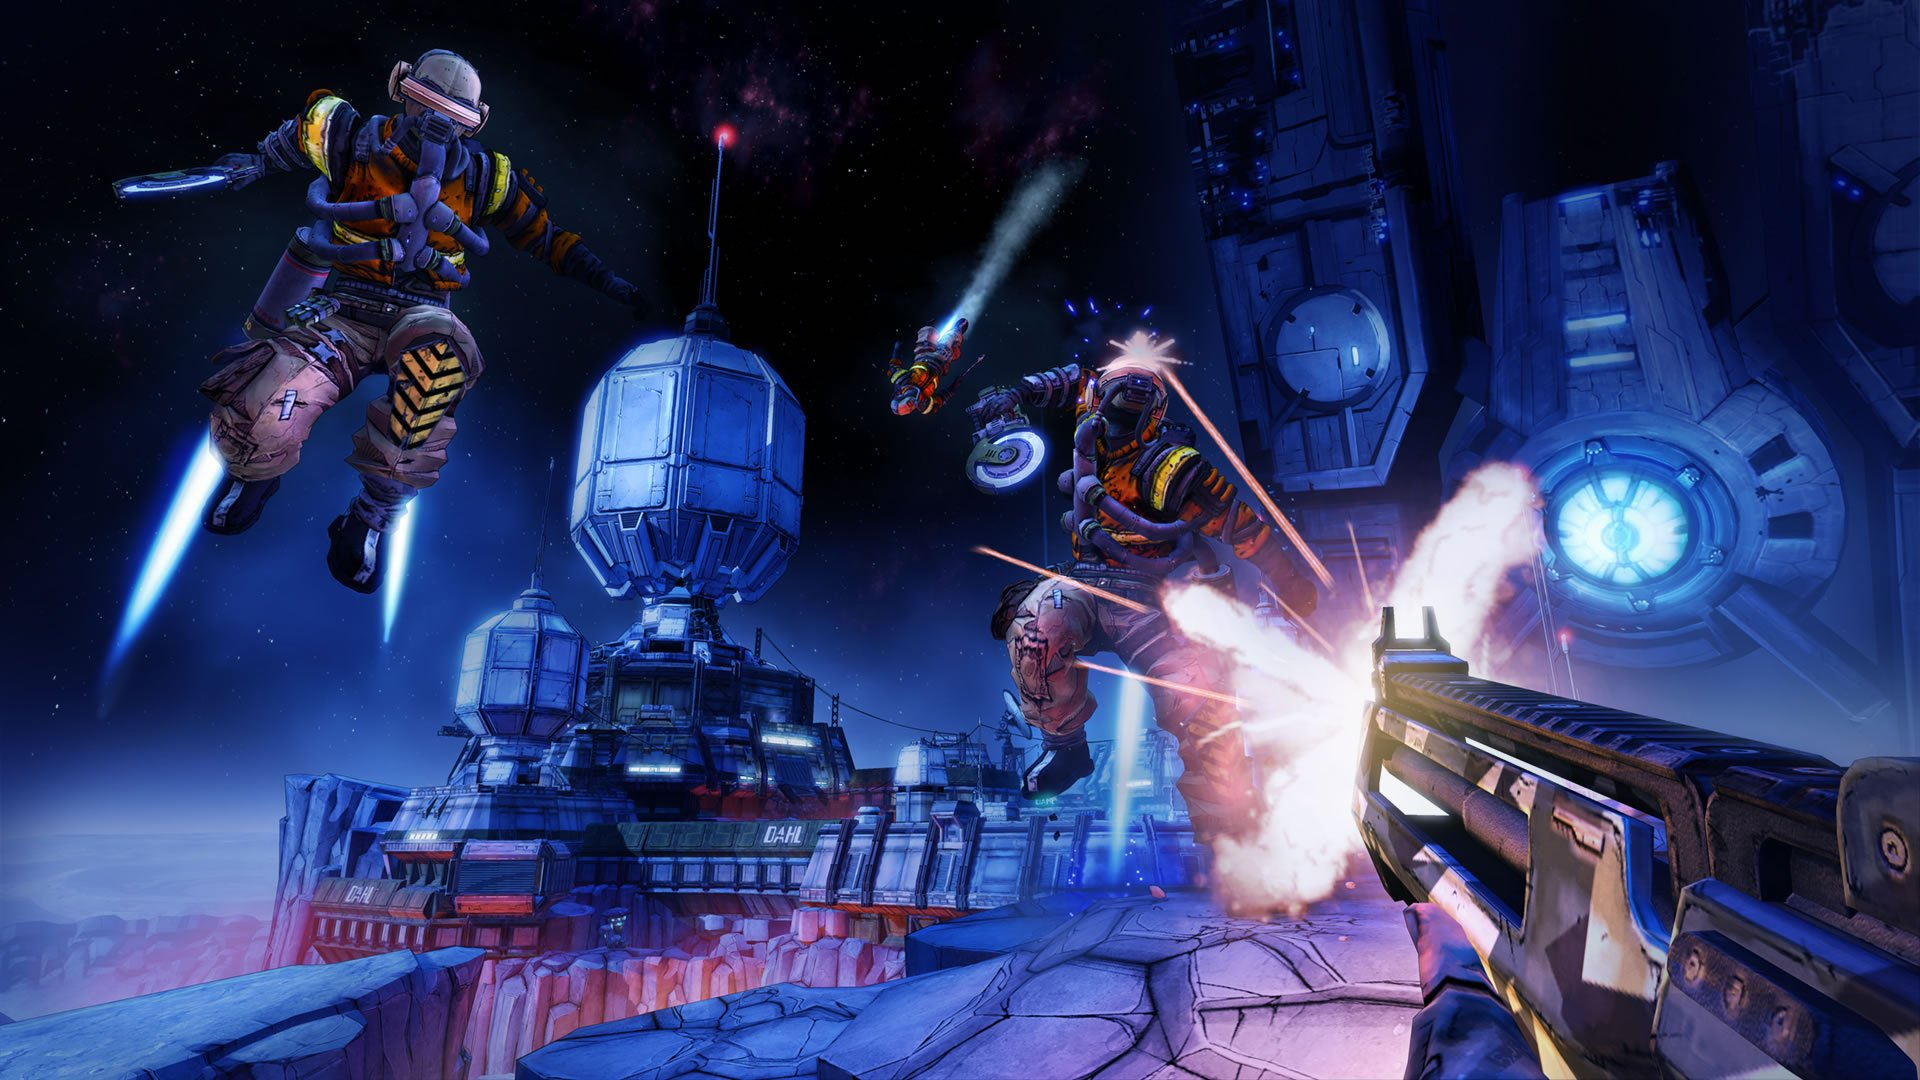 borderlands-the-pre-sequel-gameplay-screenshot-flying-enemies